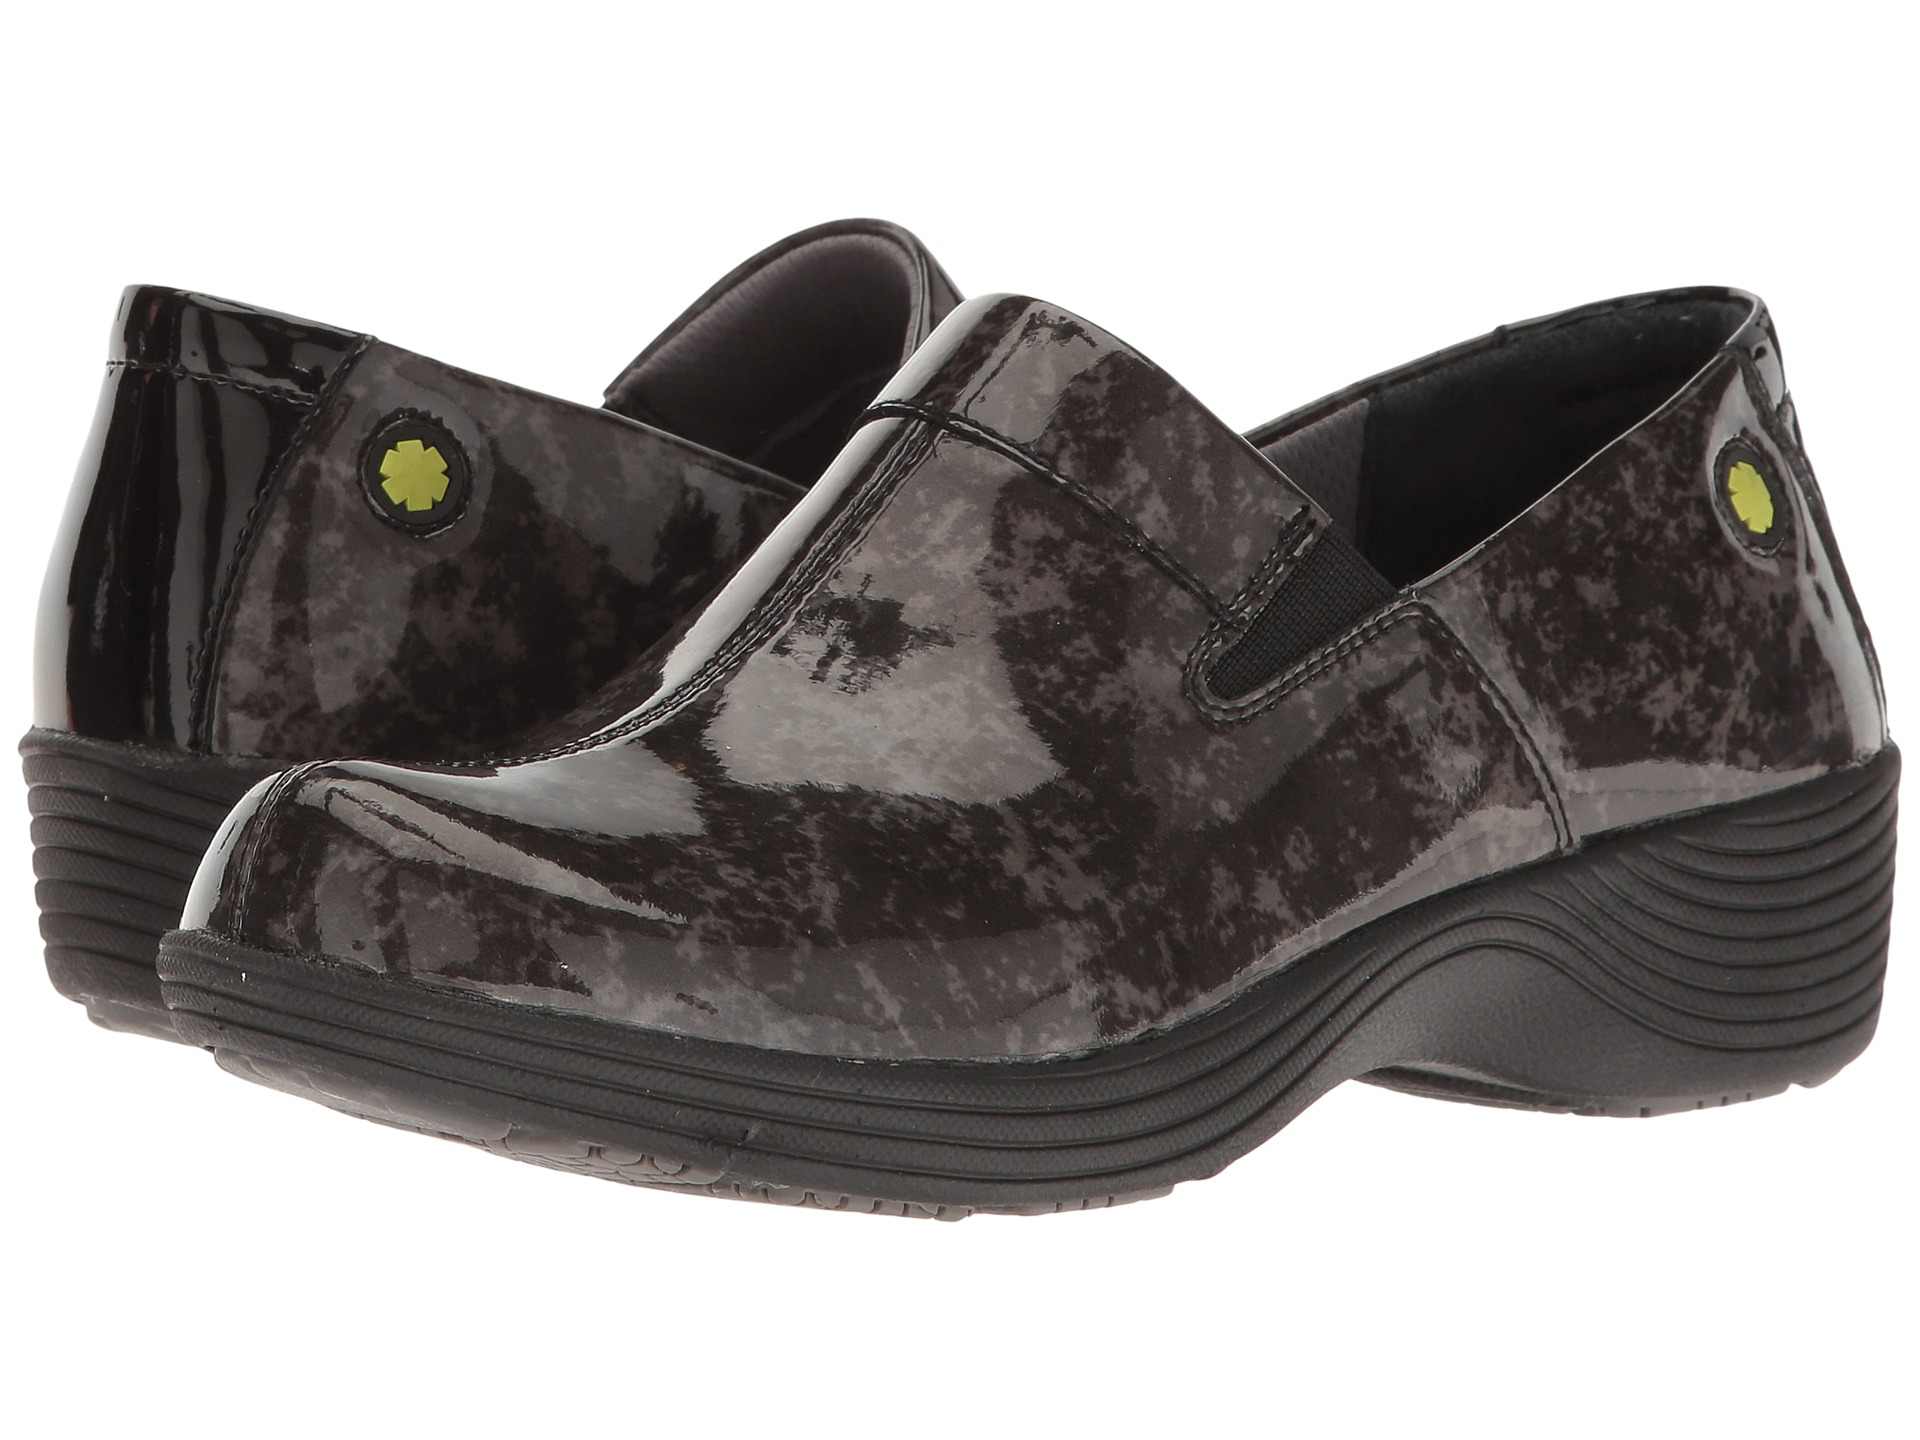 Dansko Work Shoes Reviews